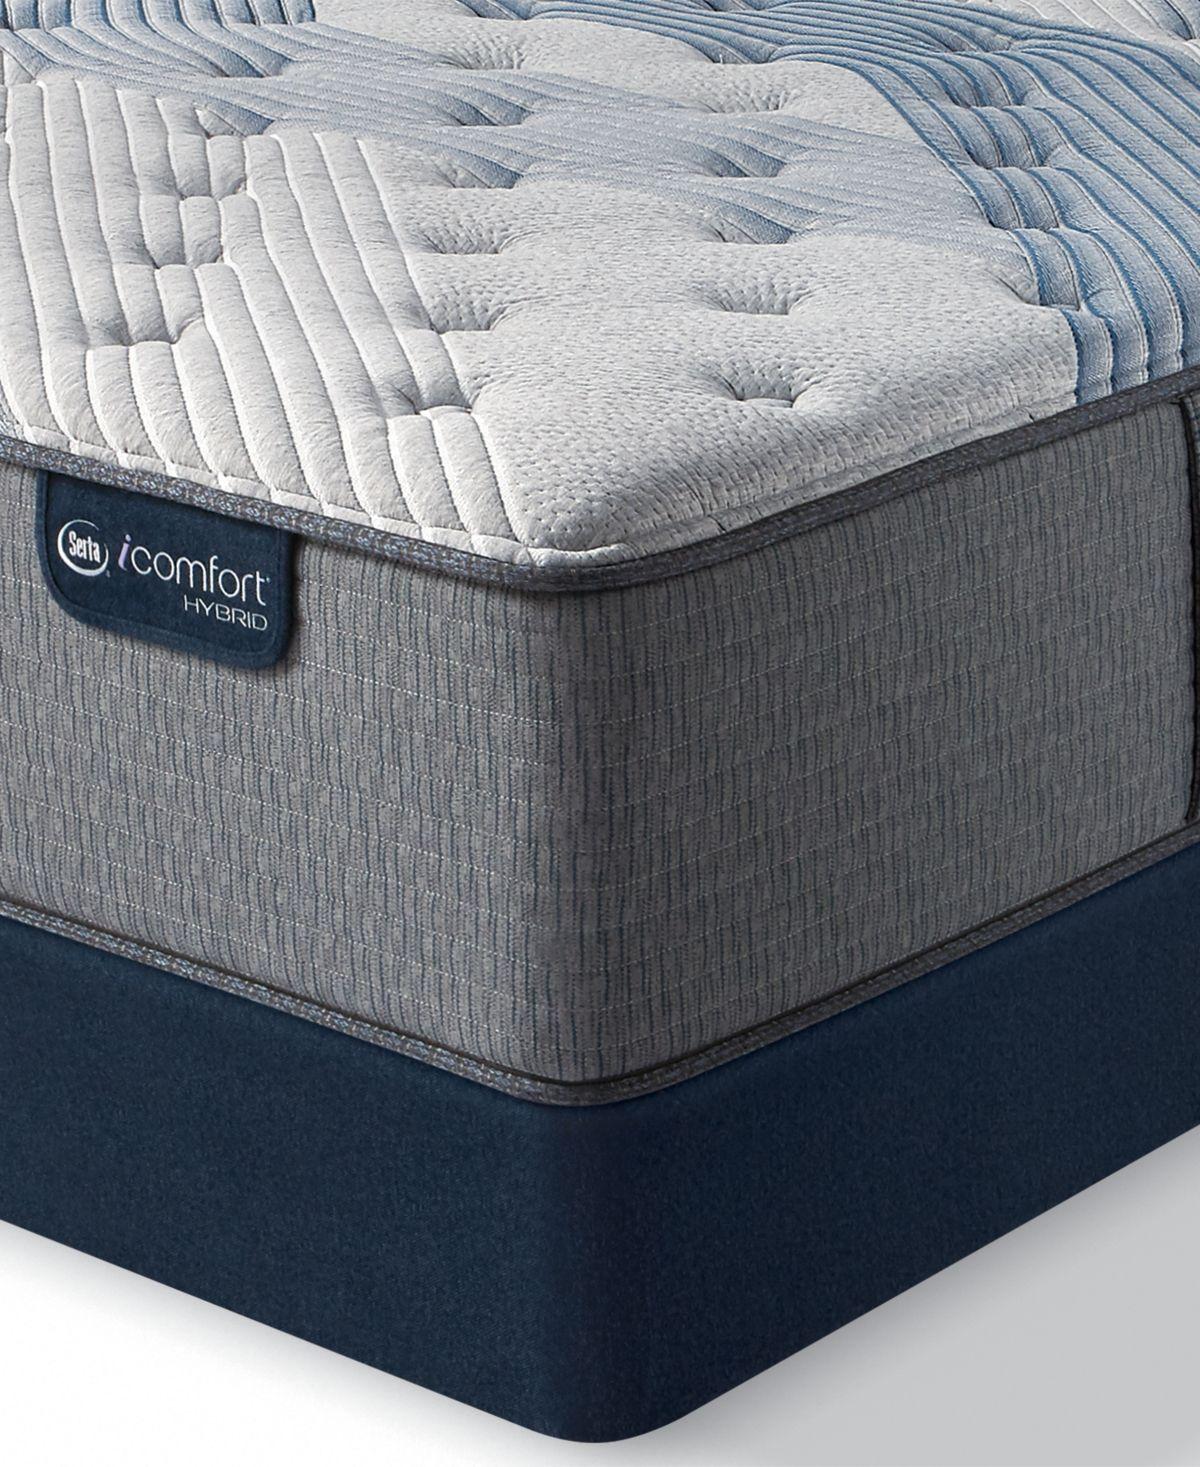 Icomfort By Serta Blue Fusion 1000 14 5 Hybrid Luxury Firm